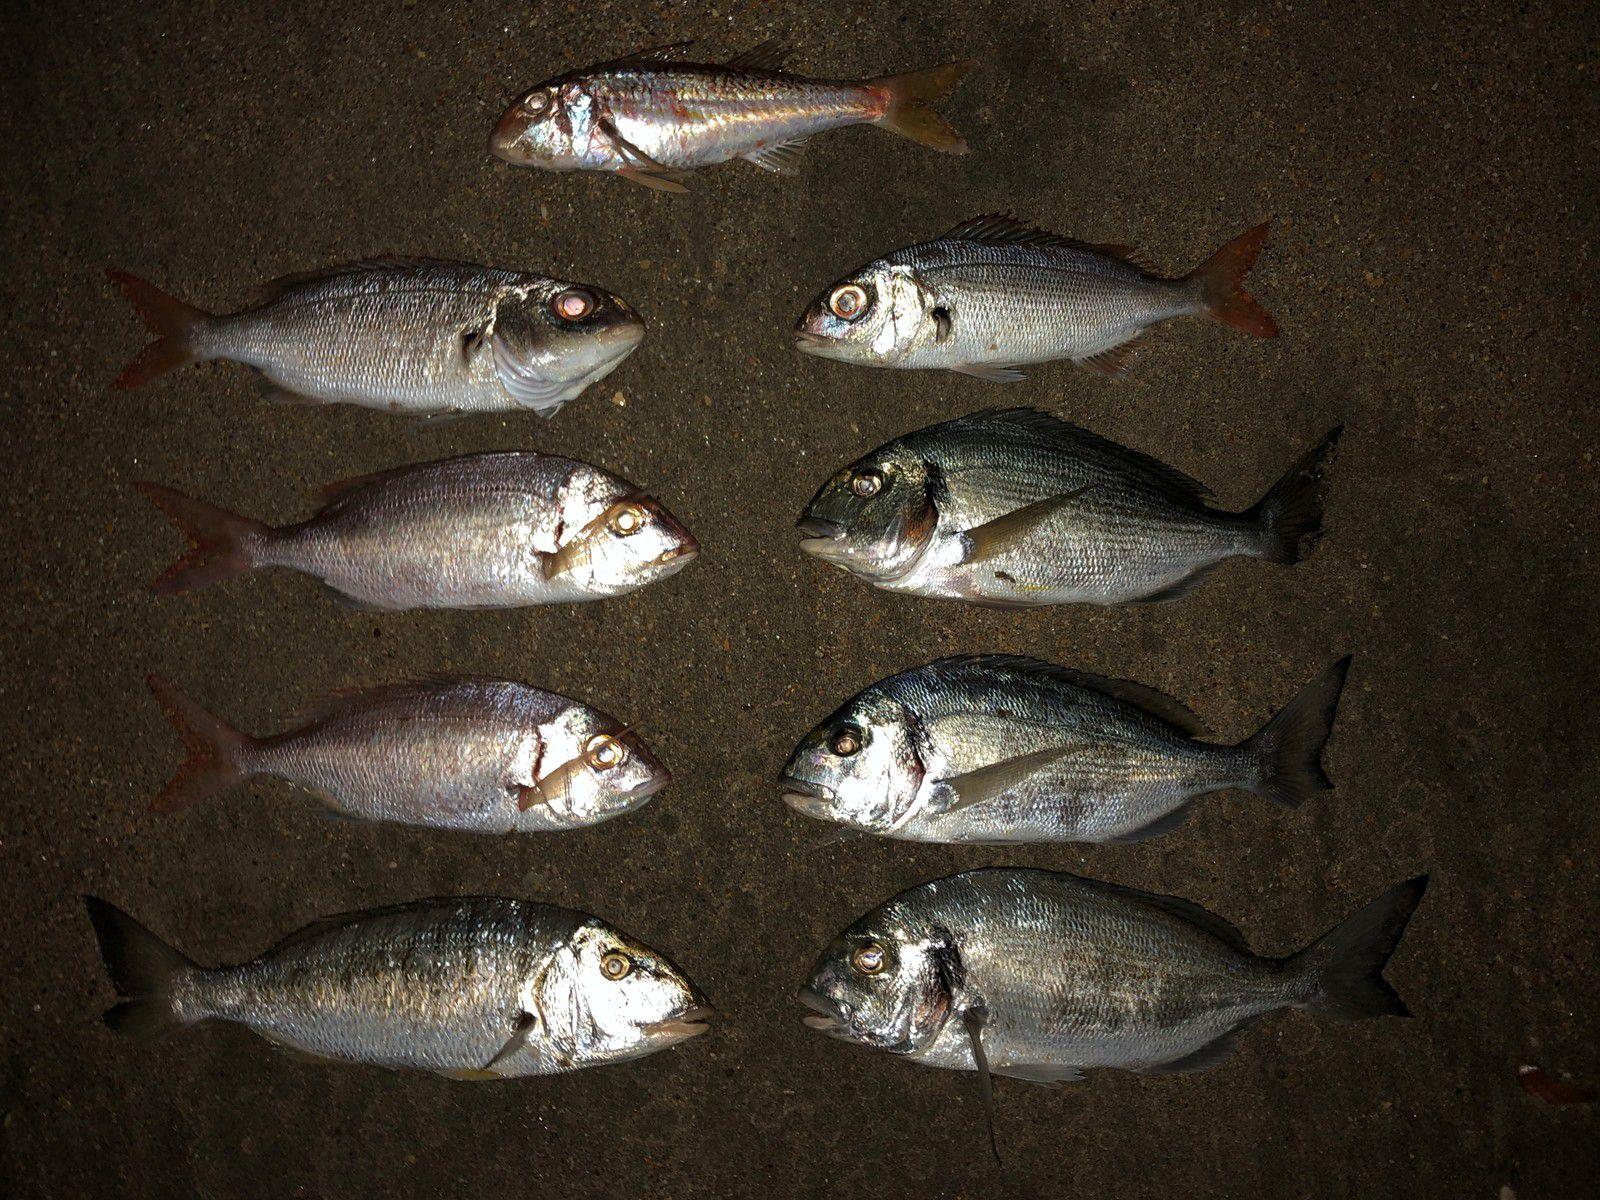 05/08/20 - Petite pêche variée